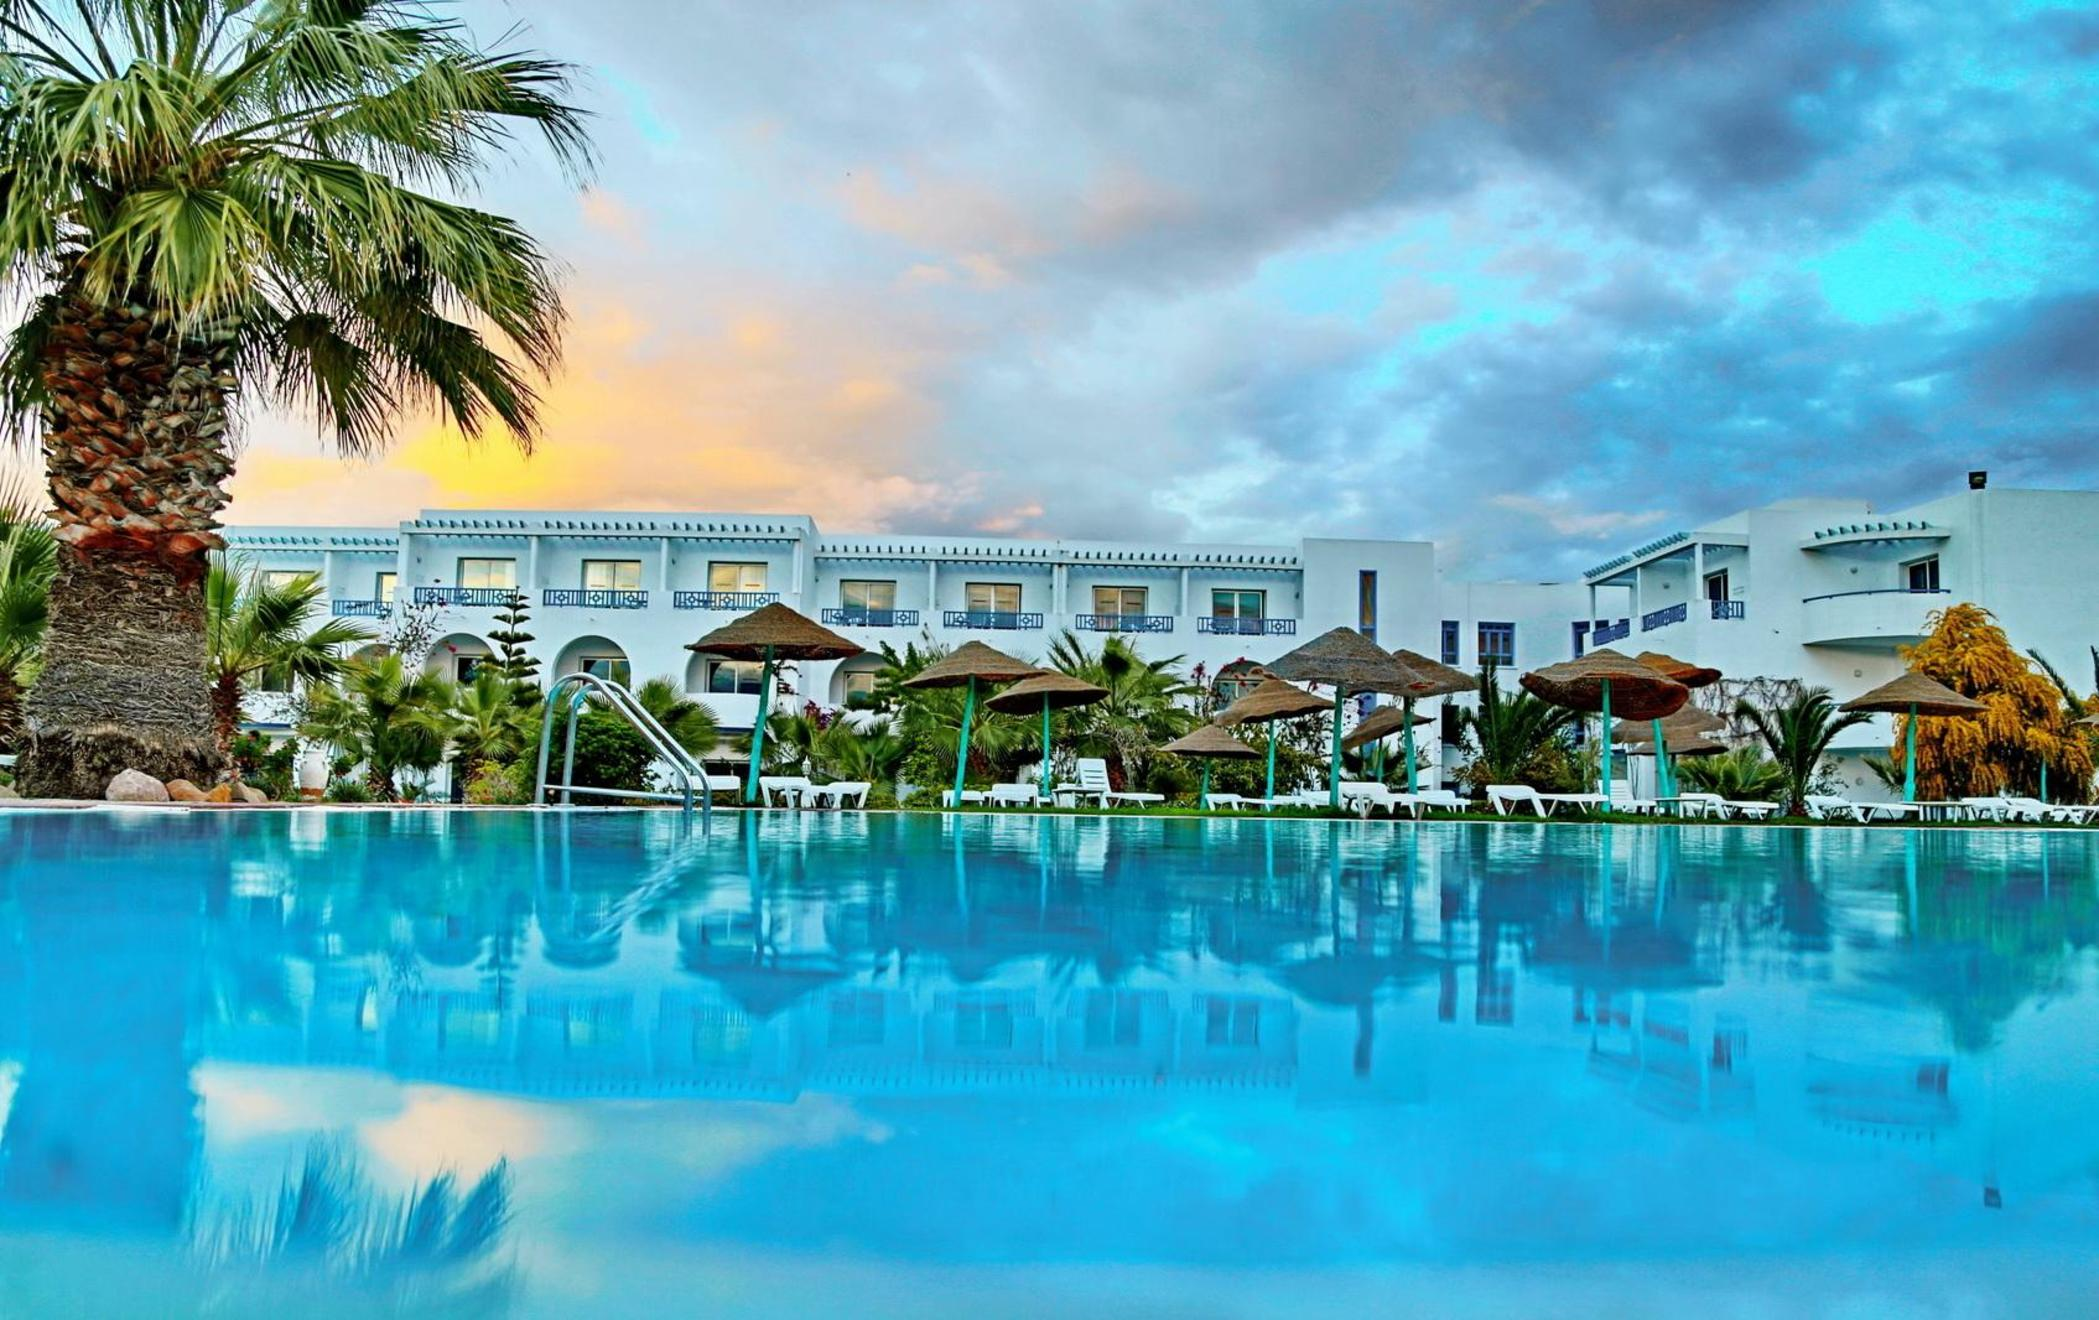 Cyclamens Hotel Mechmoum, Bouficha